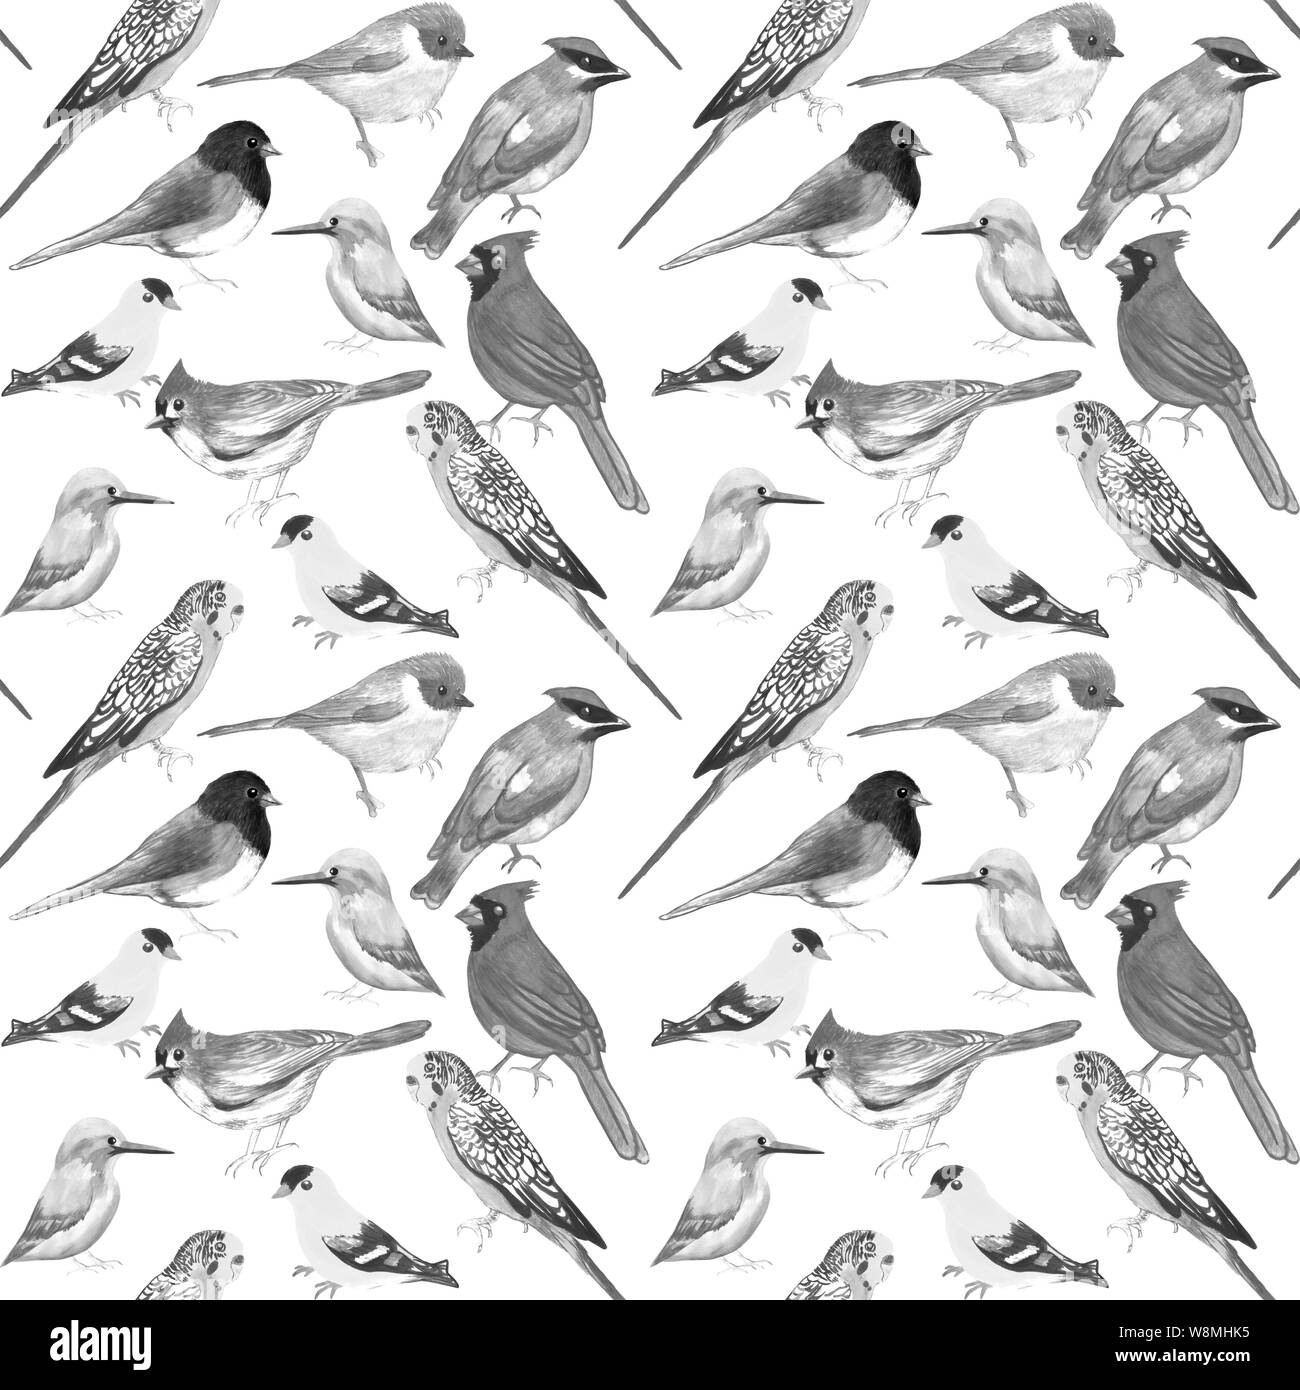 Black and white birds against white background seamless artwork Stock Photo